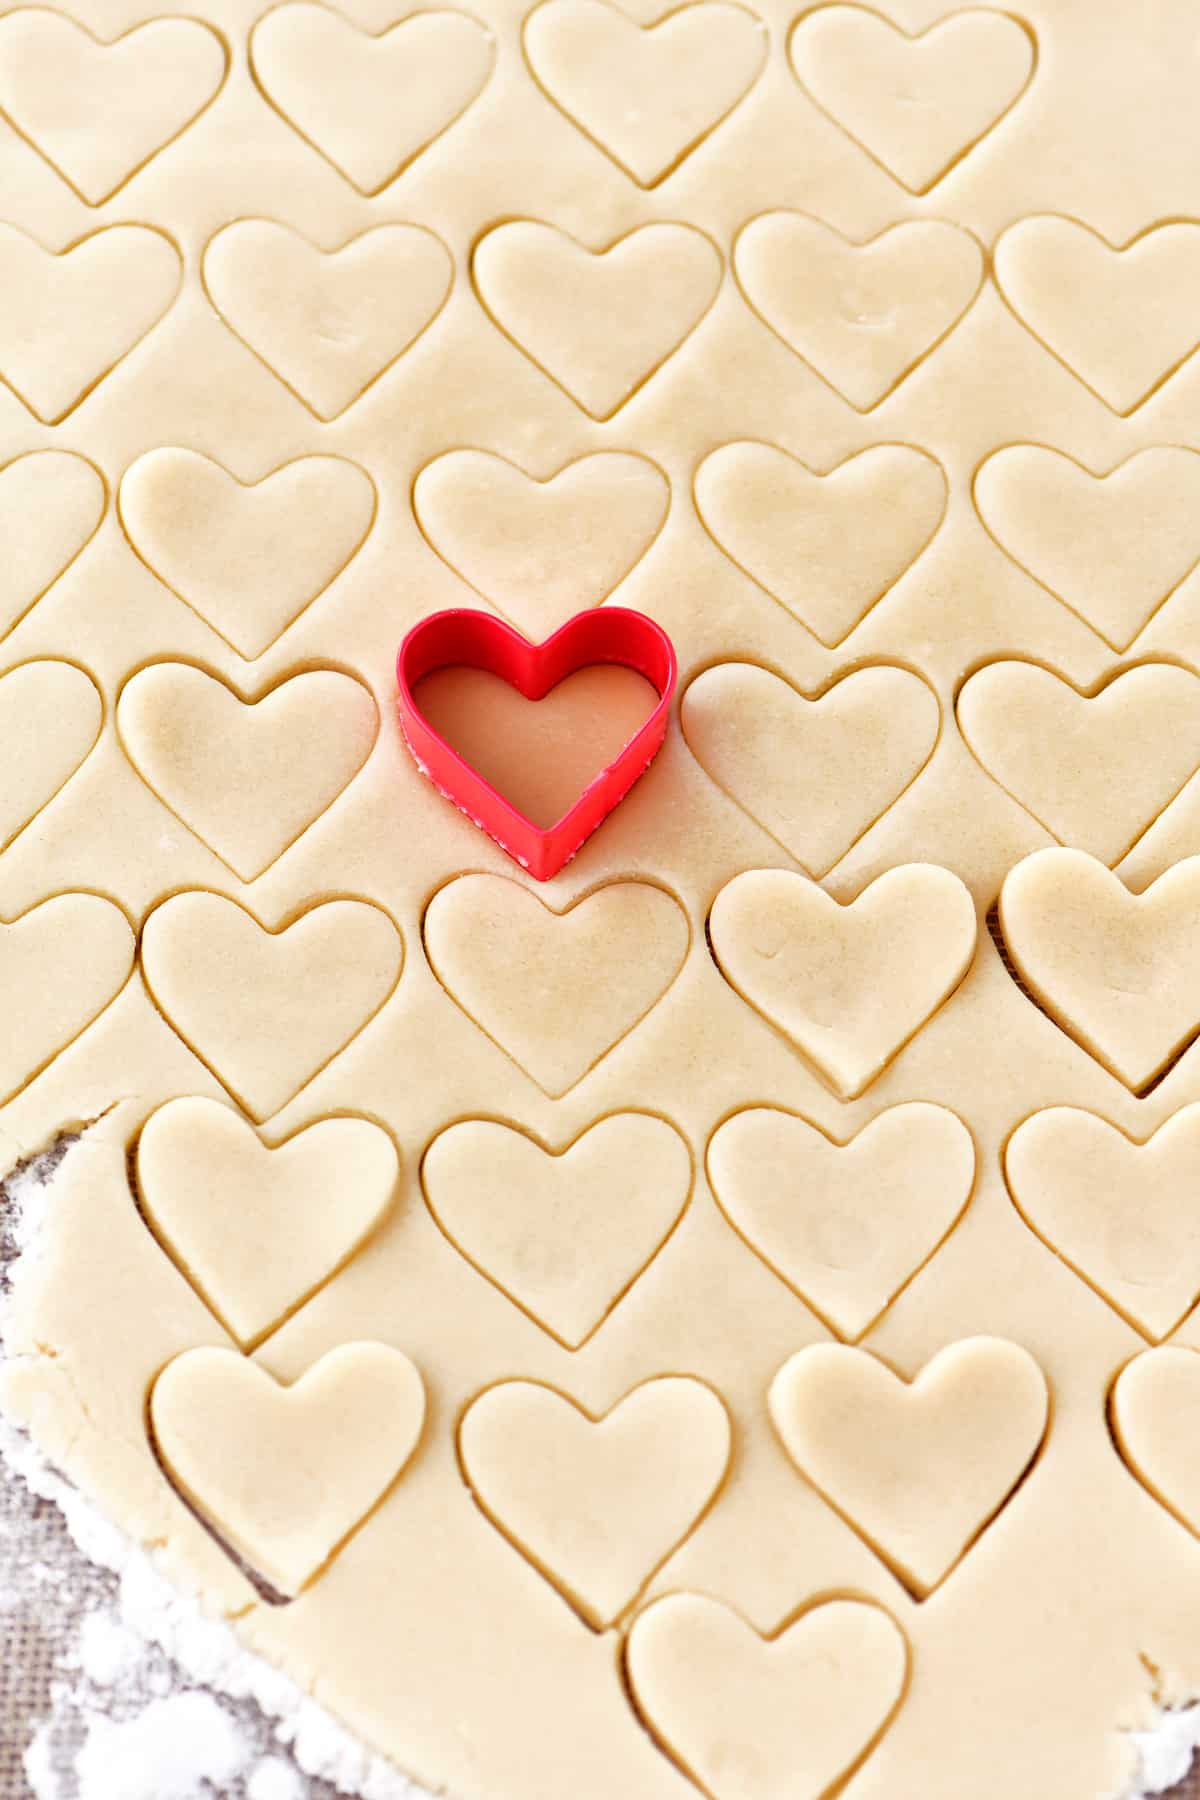 heart shaped cookie cutter cutting dough